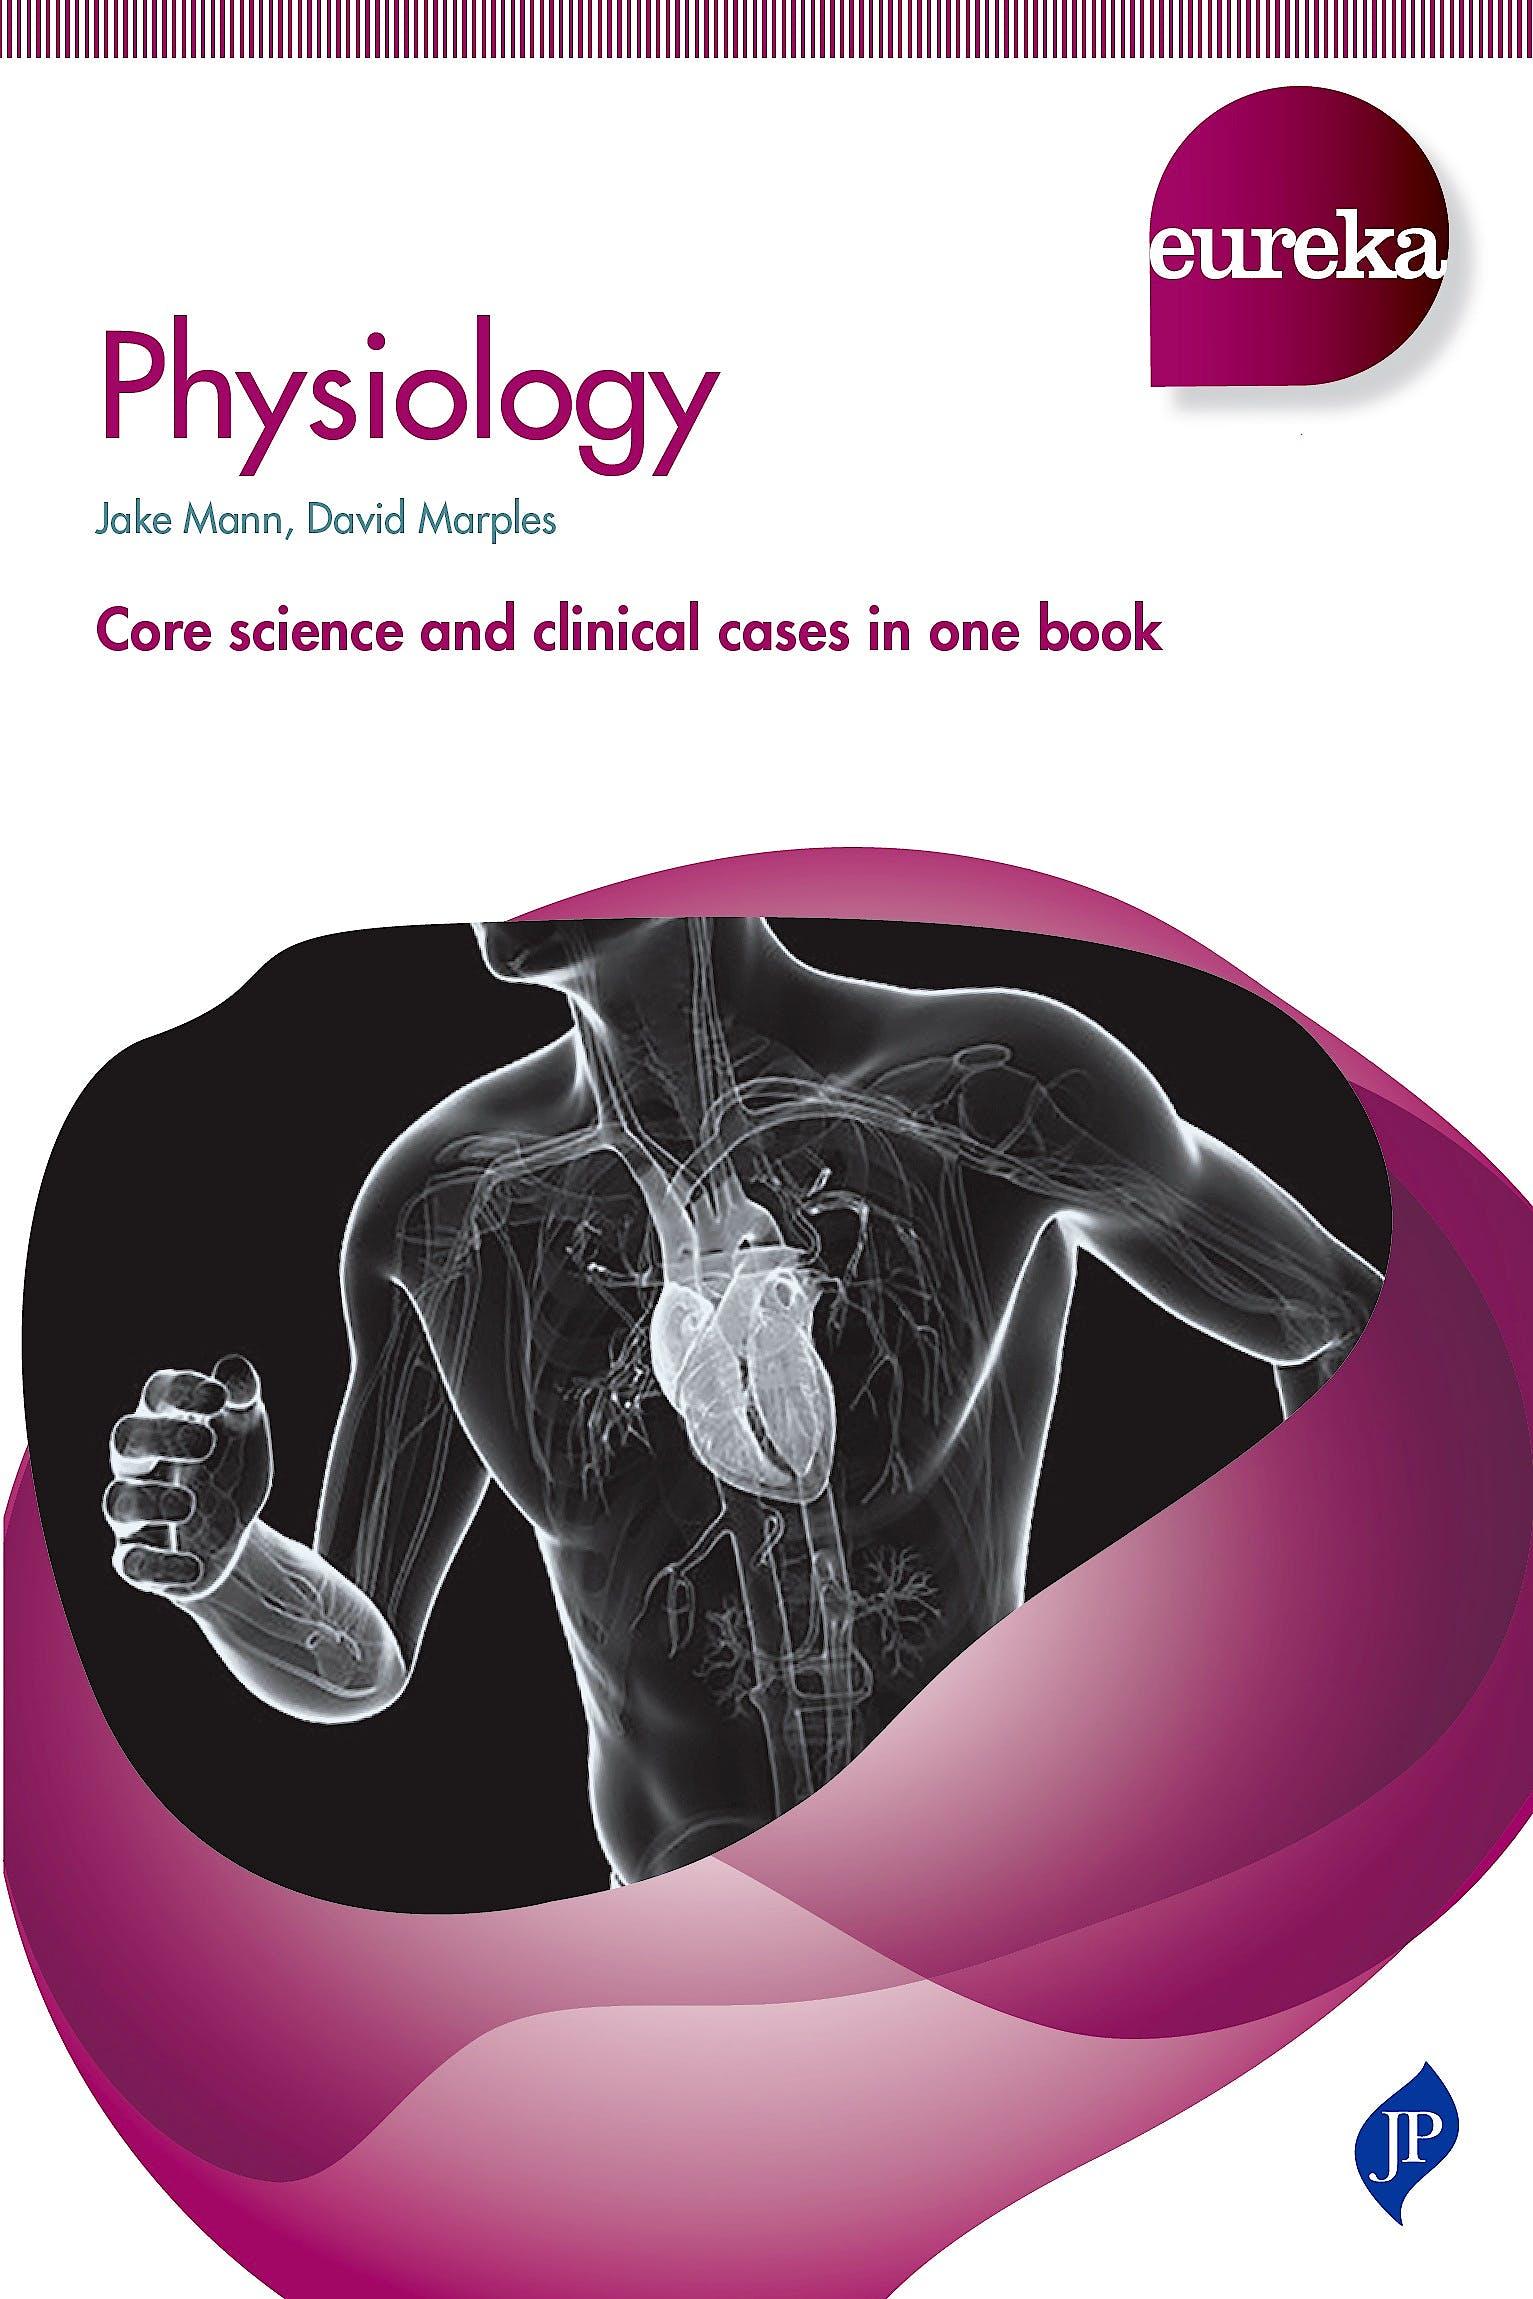 Portada del libro 9781909836075 Eureka: Physiology